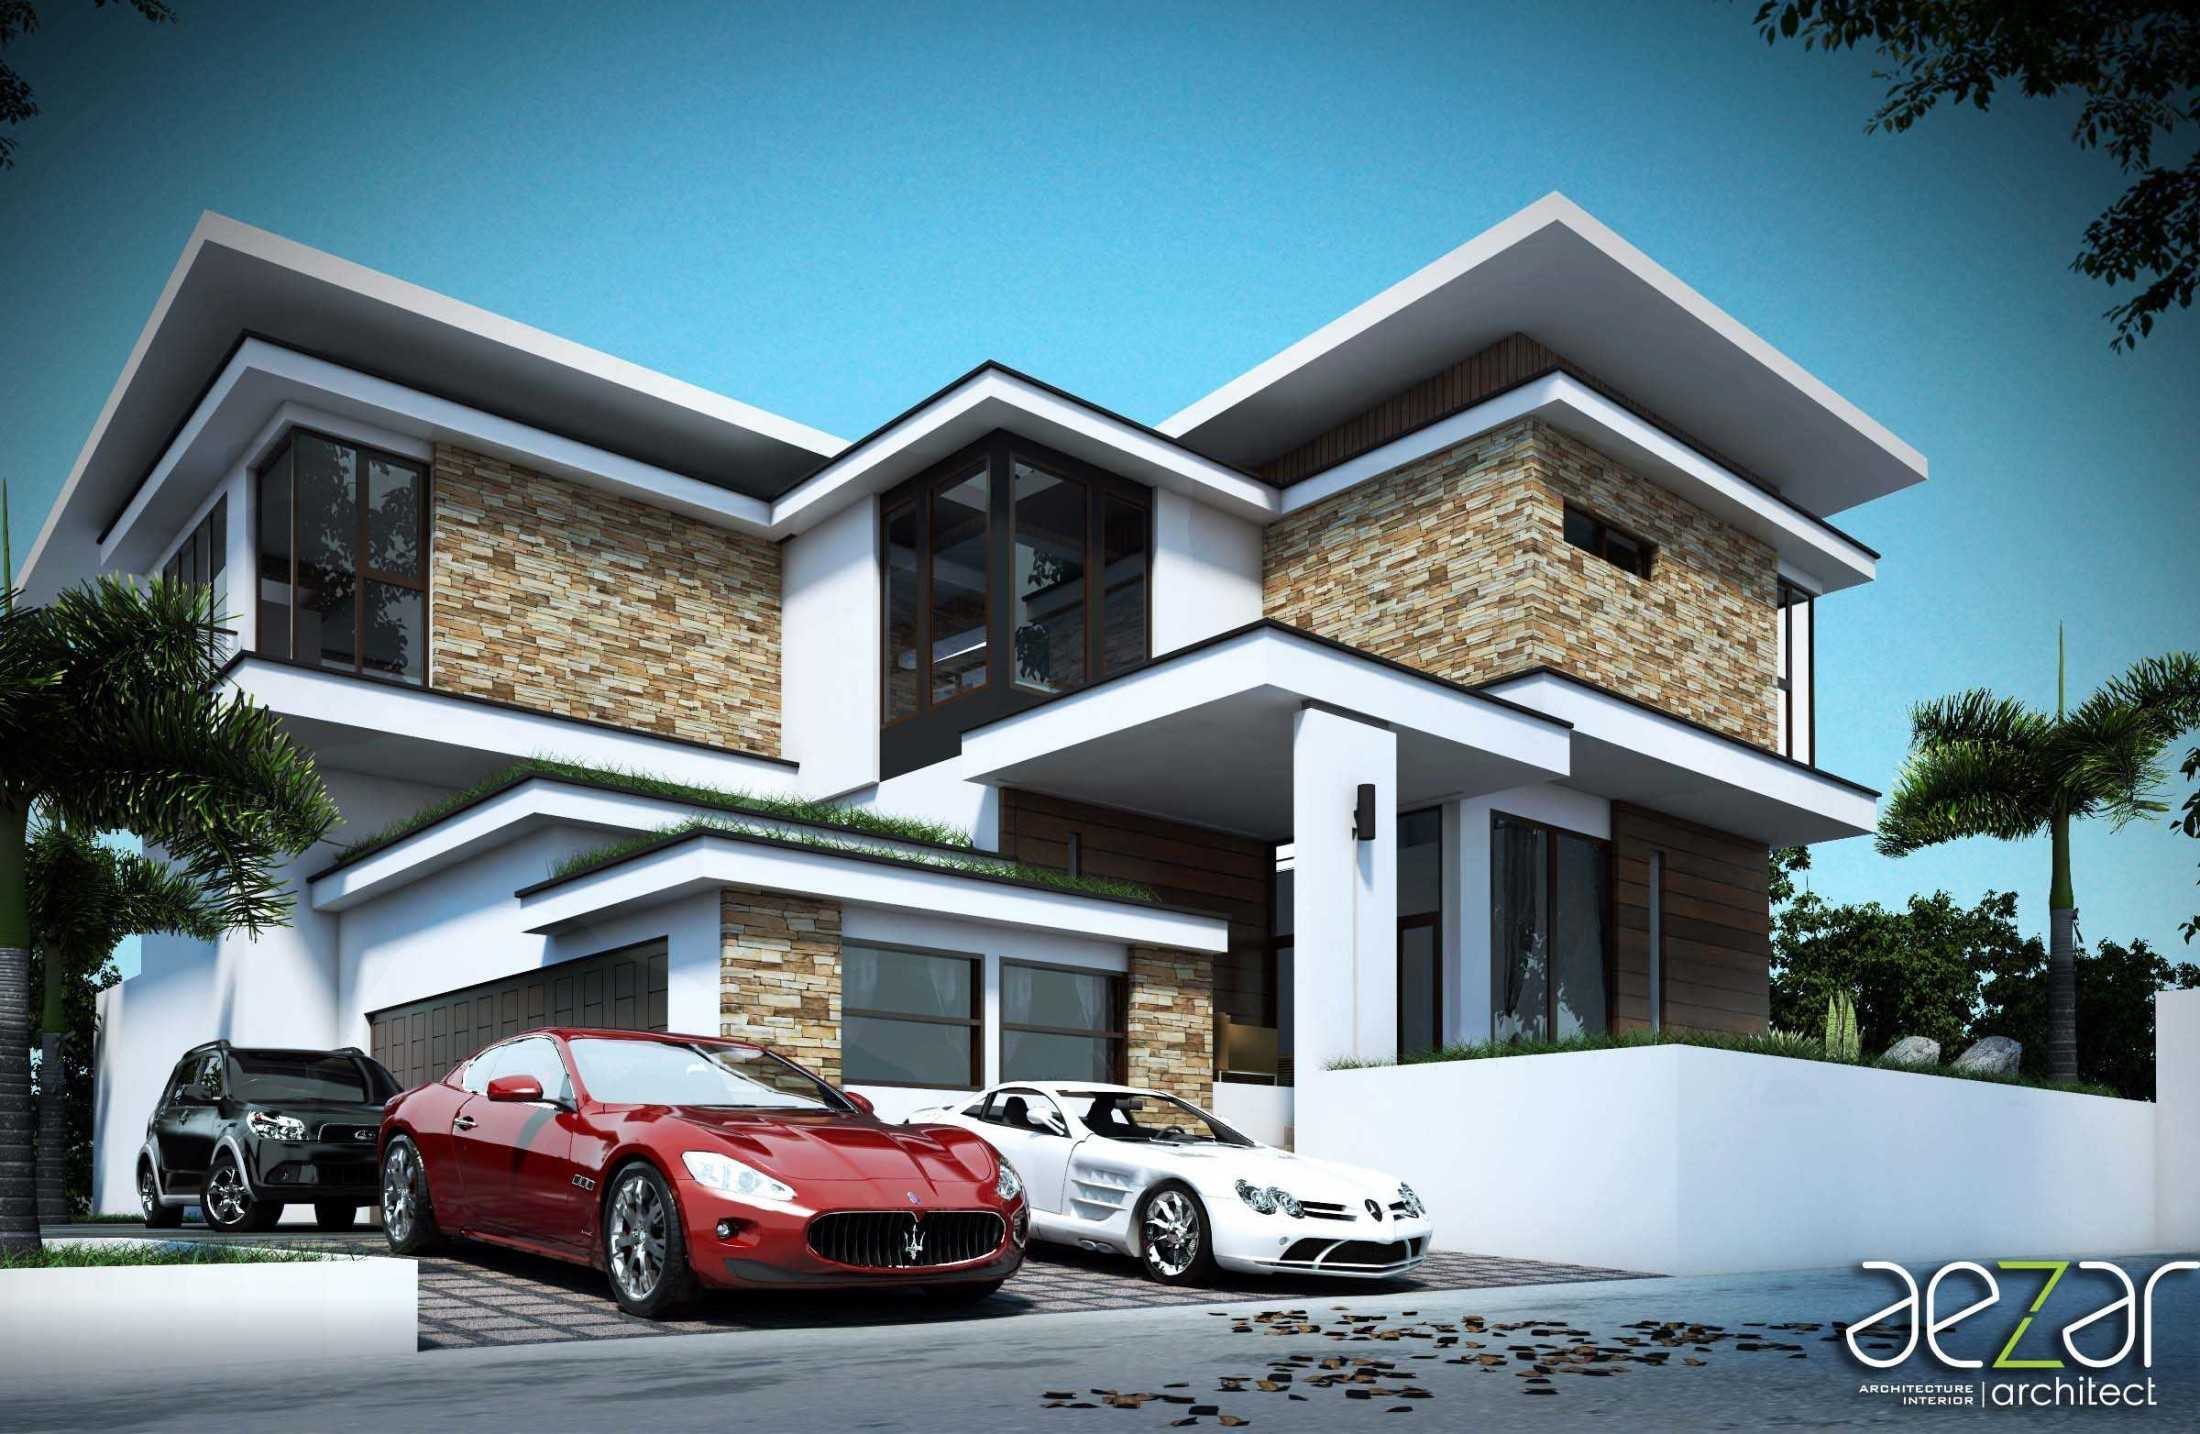 Aezar Architect Zk House Medan, Kota Medan, Sumatera Utara, Indonesia Medan, Kota Medan, Sumatera Utara, Indonesia Exterior View  54459